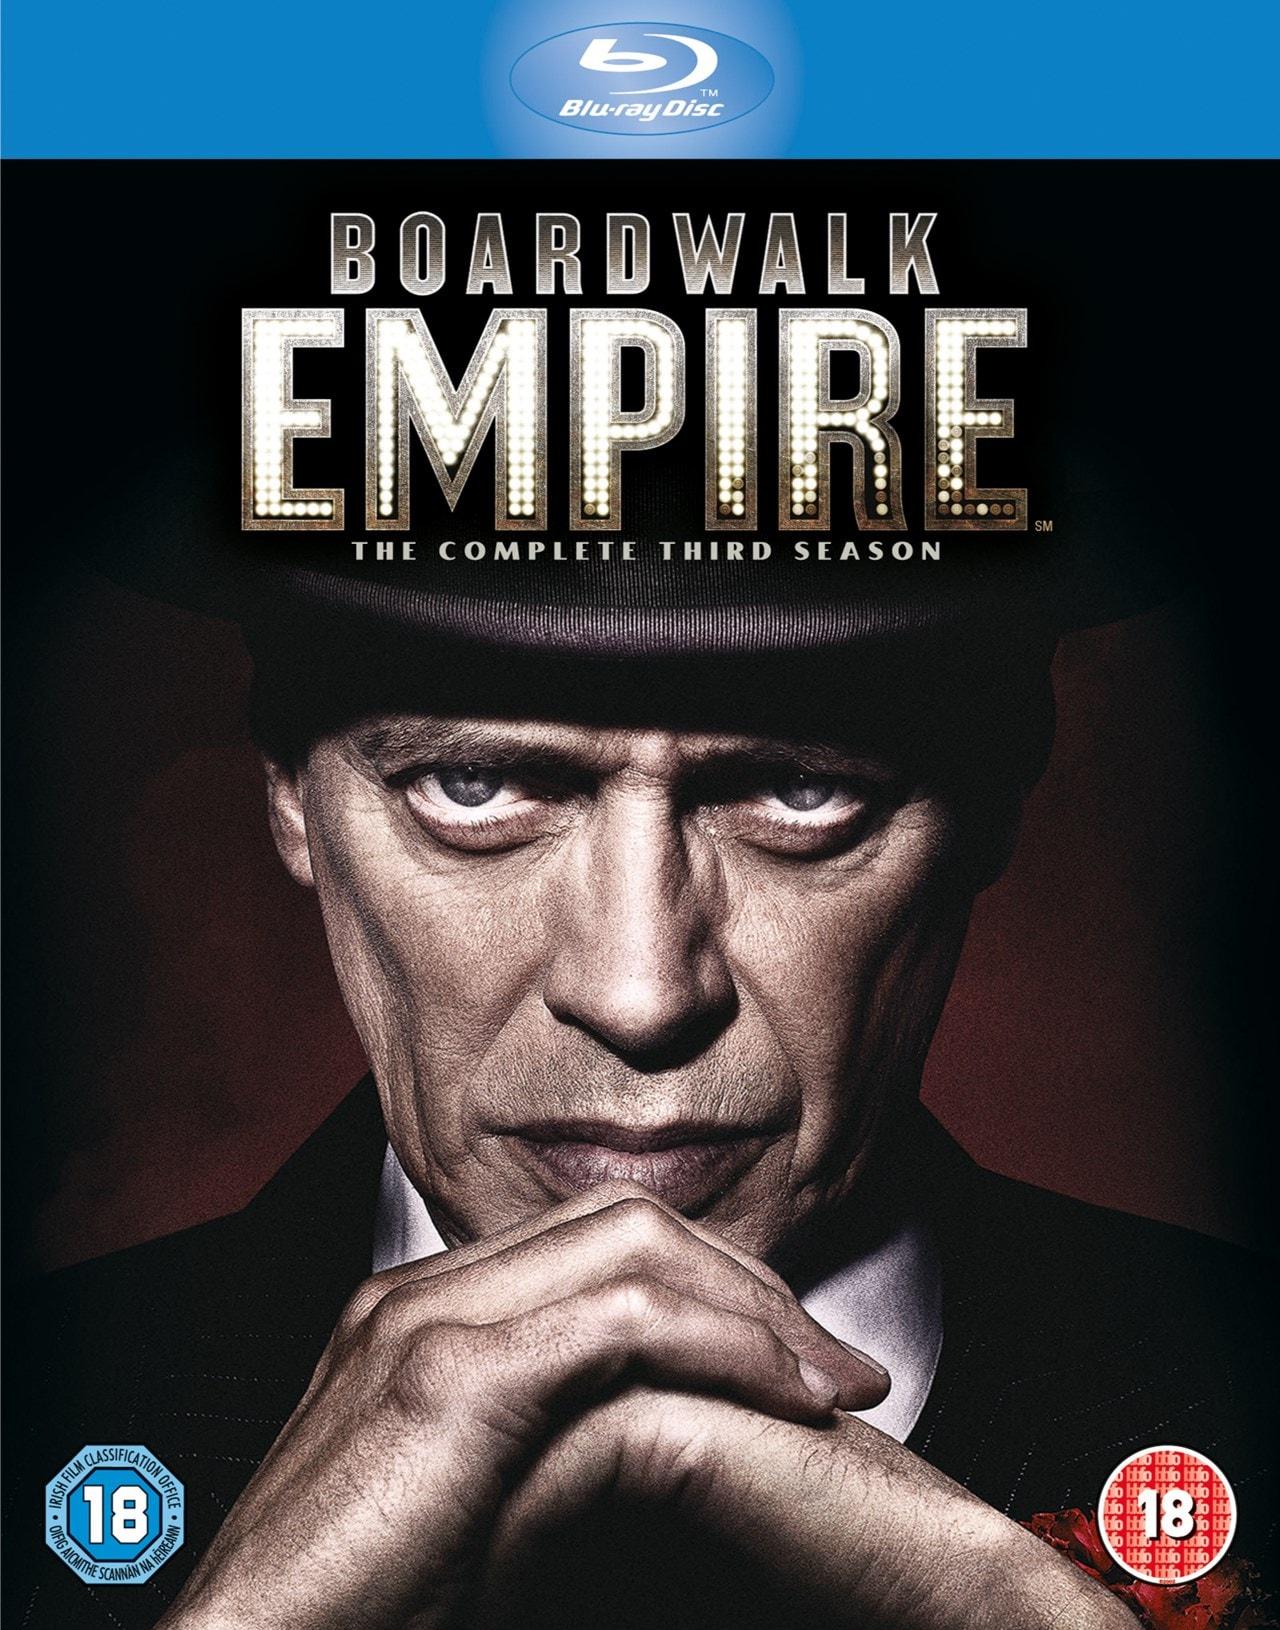 Boardwalk Empire: The Complete Third Season - 1